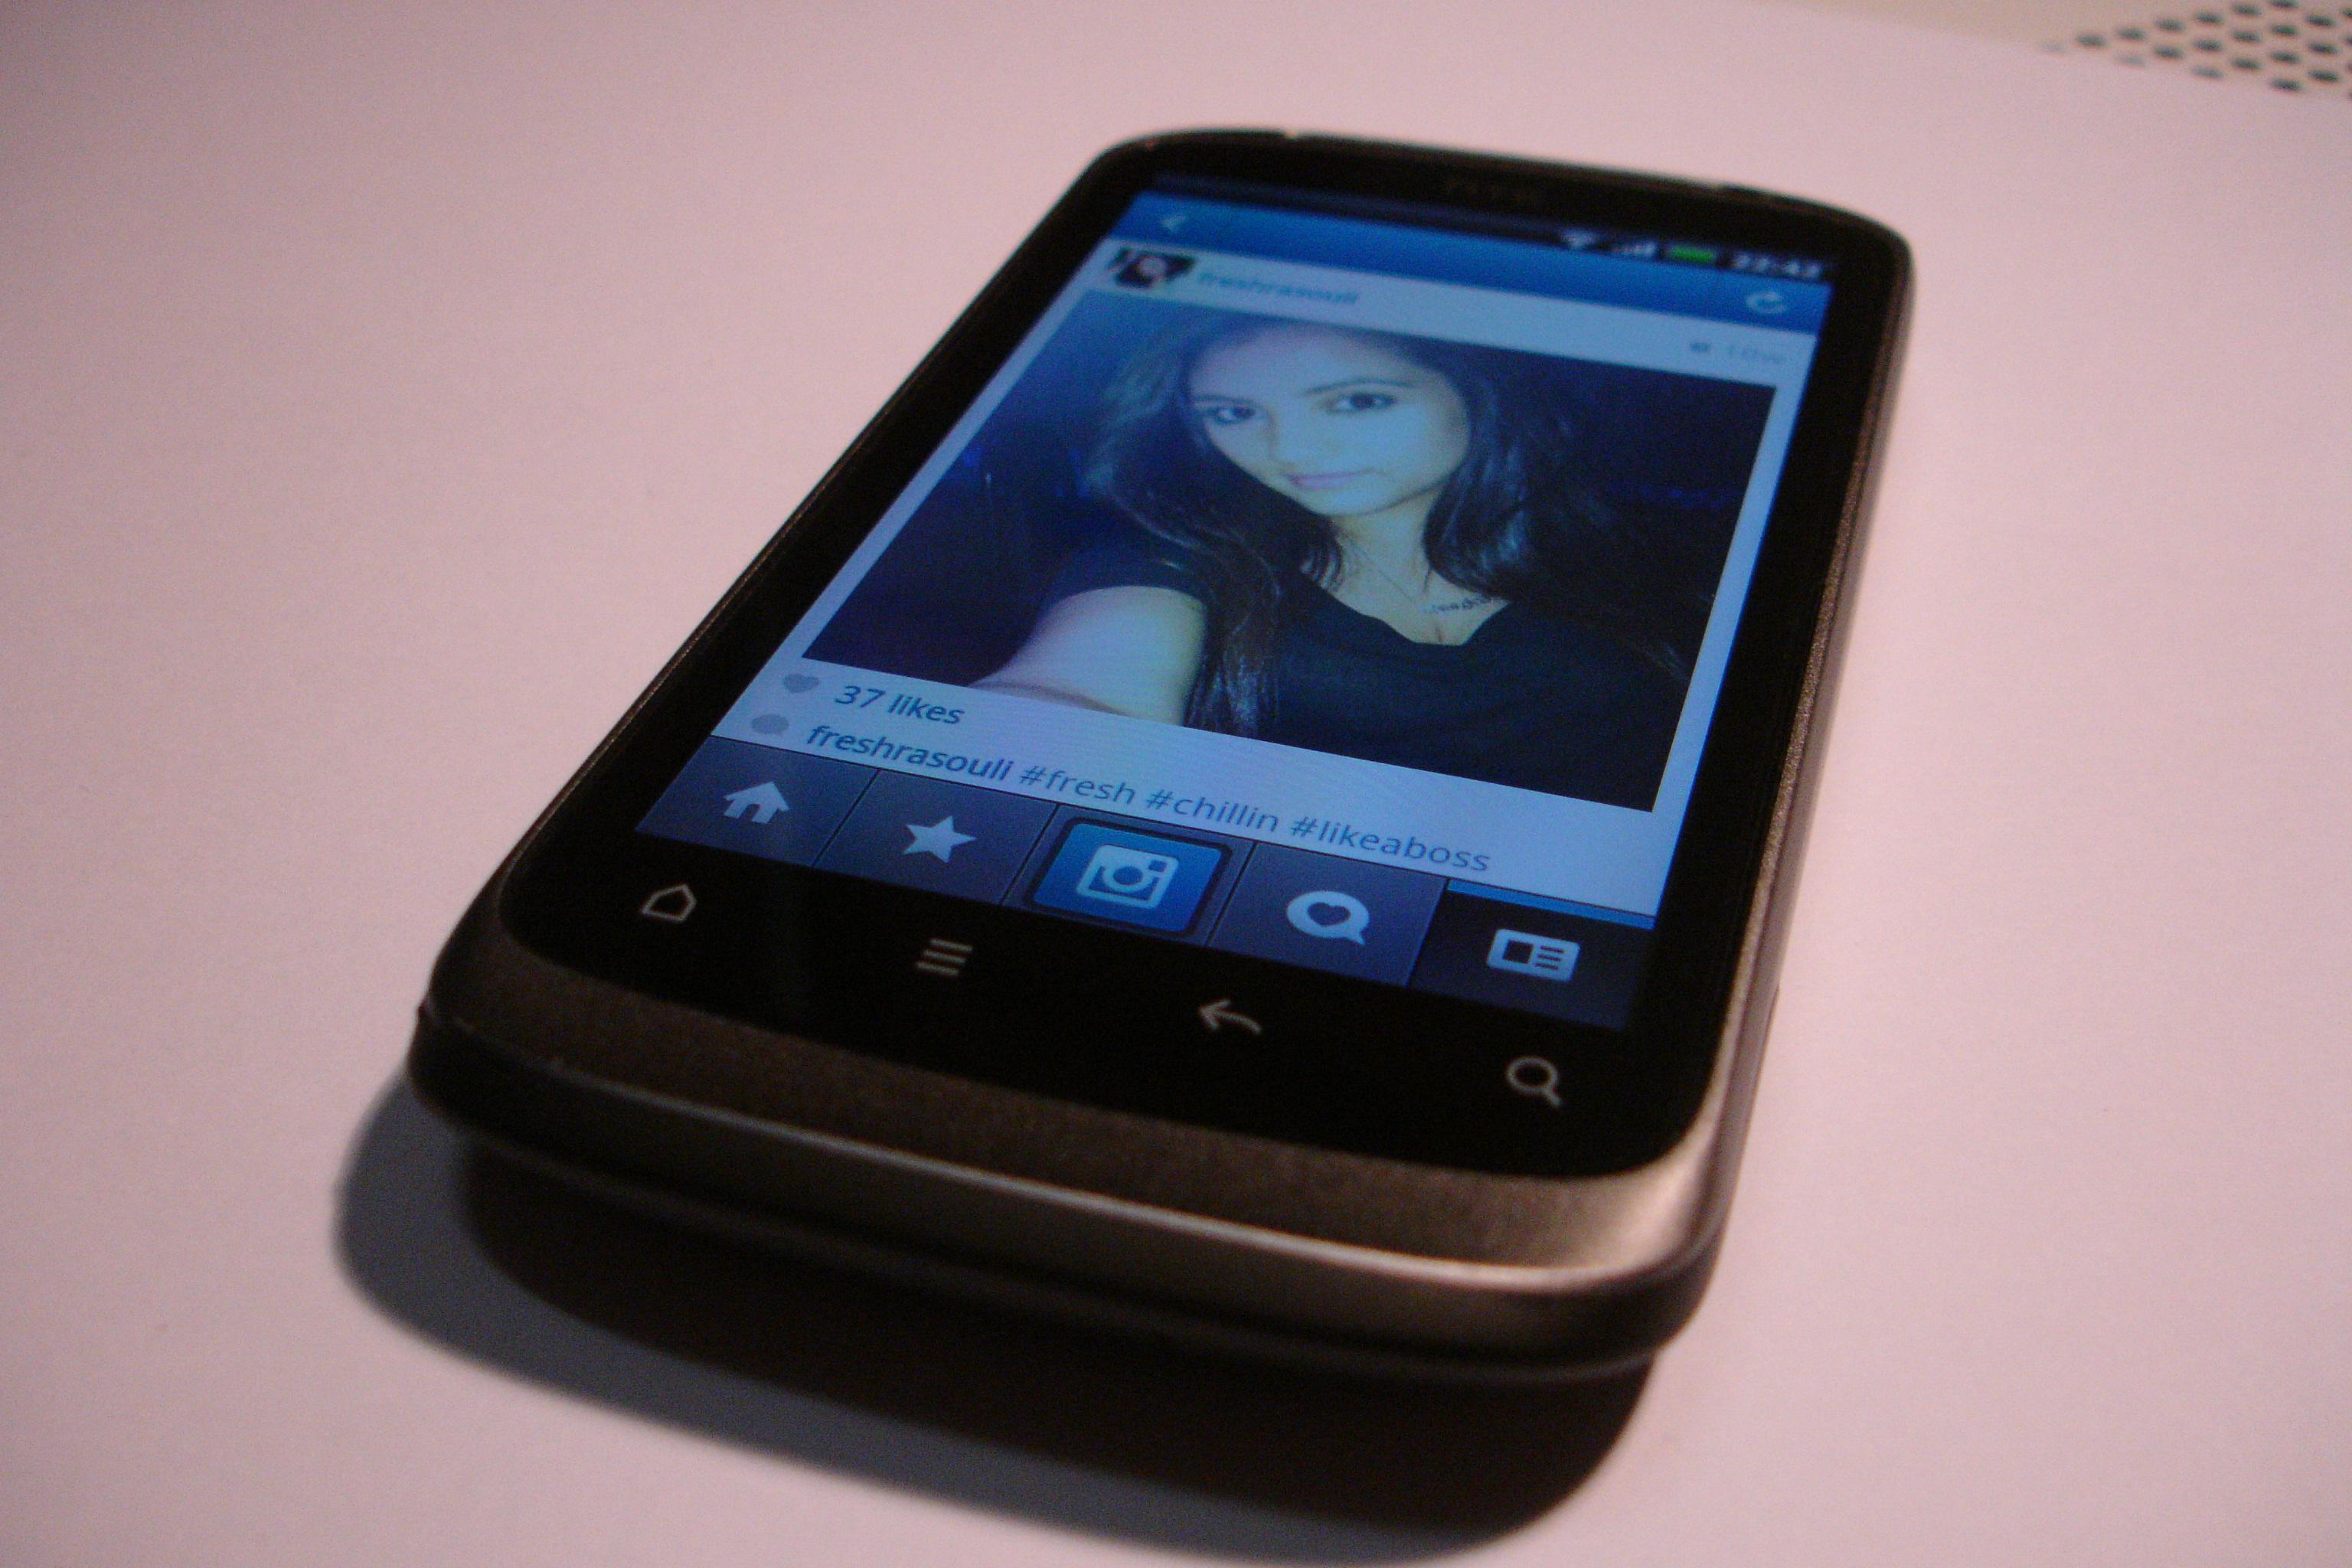 HTC Desire S   Wikipedia  the free encyclopedia